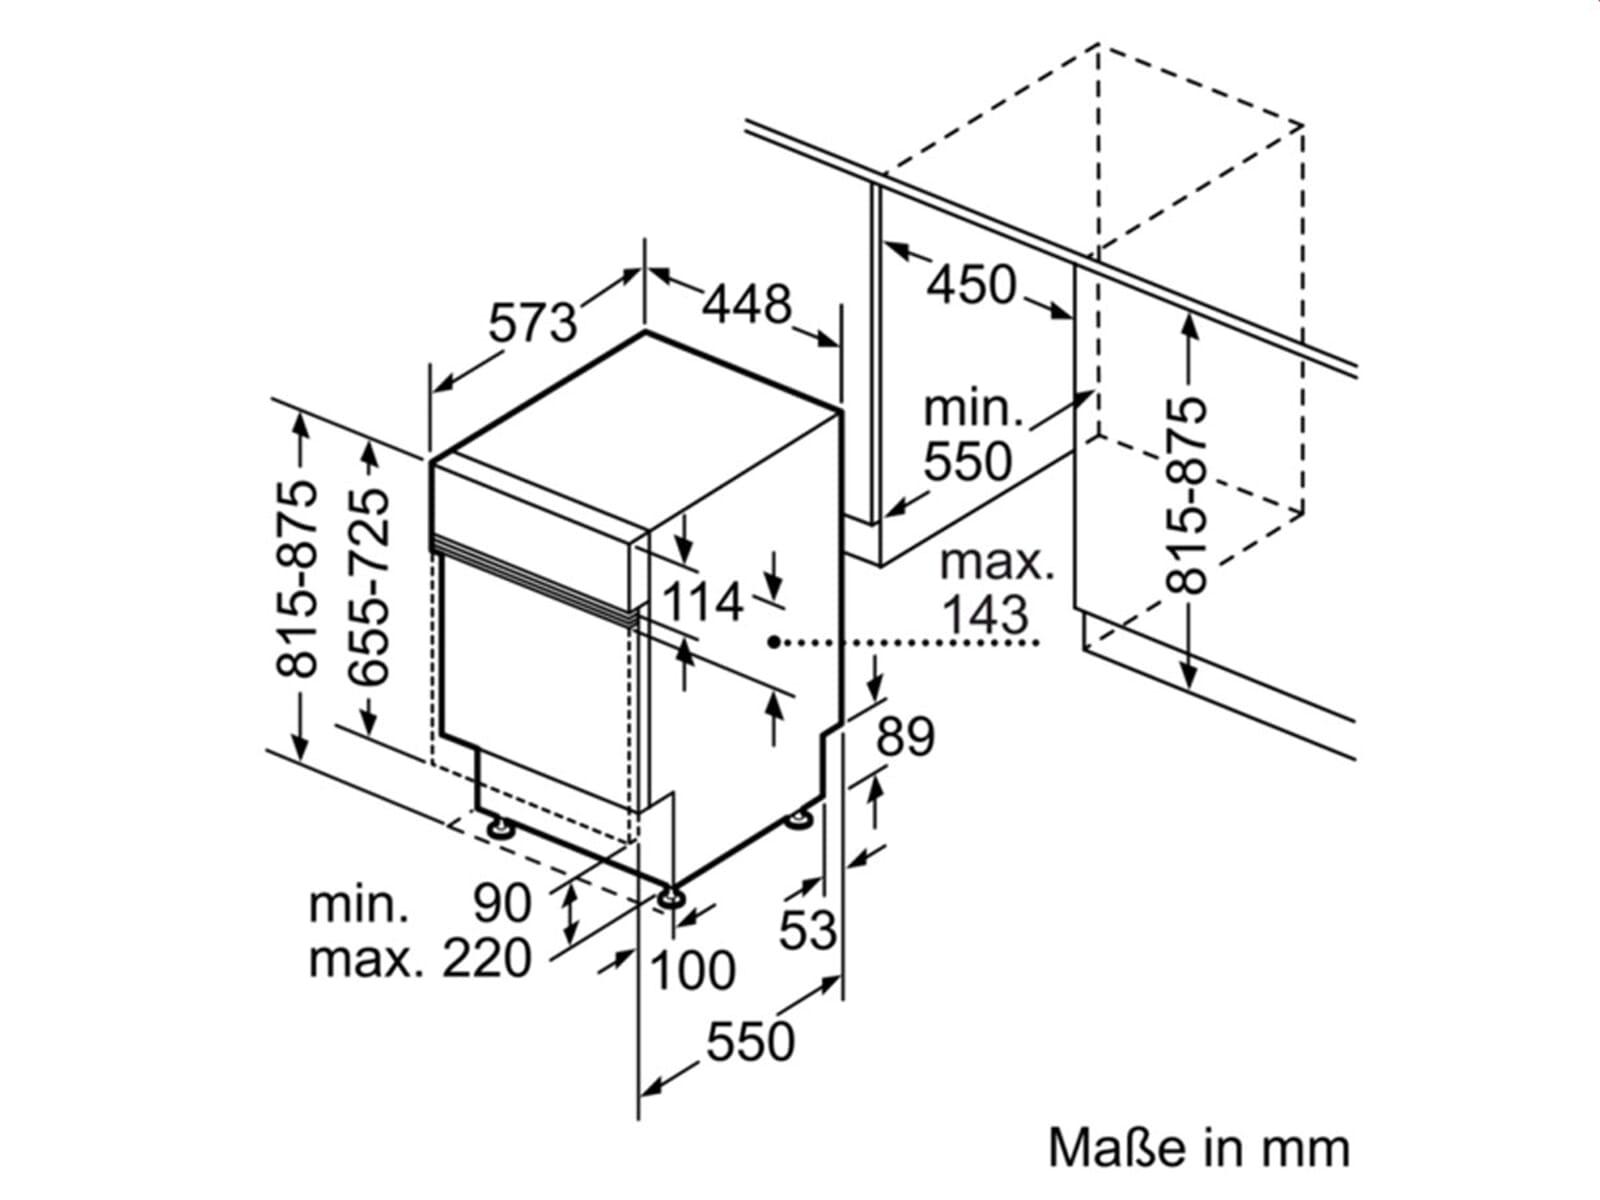 Neff GK4508MN Teillintegrierbarer Einbaugeschirrspüler